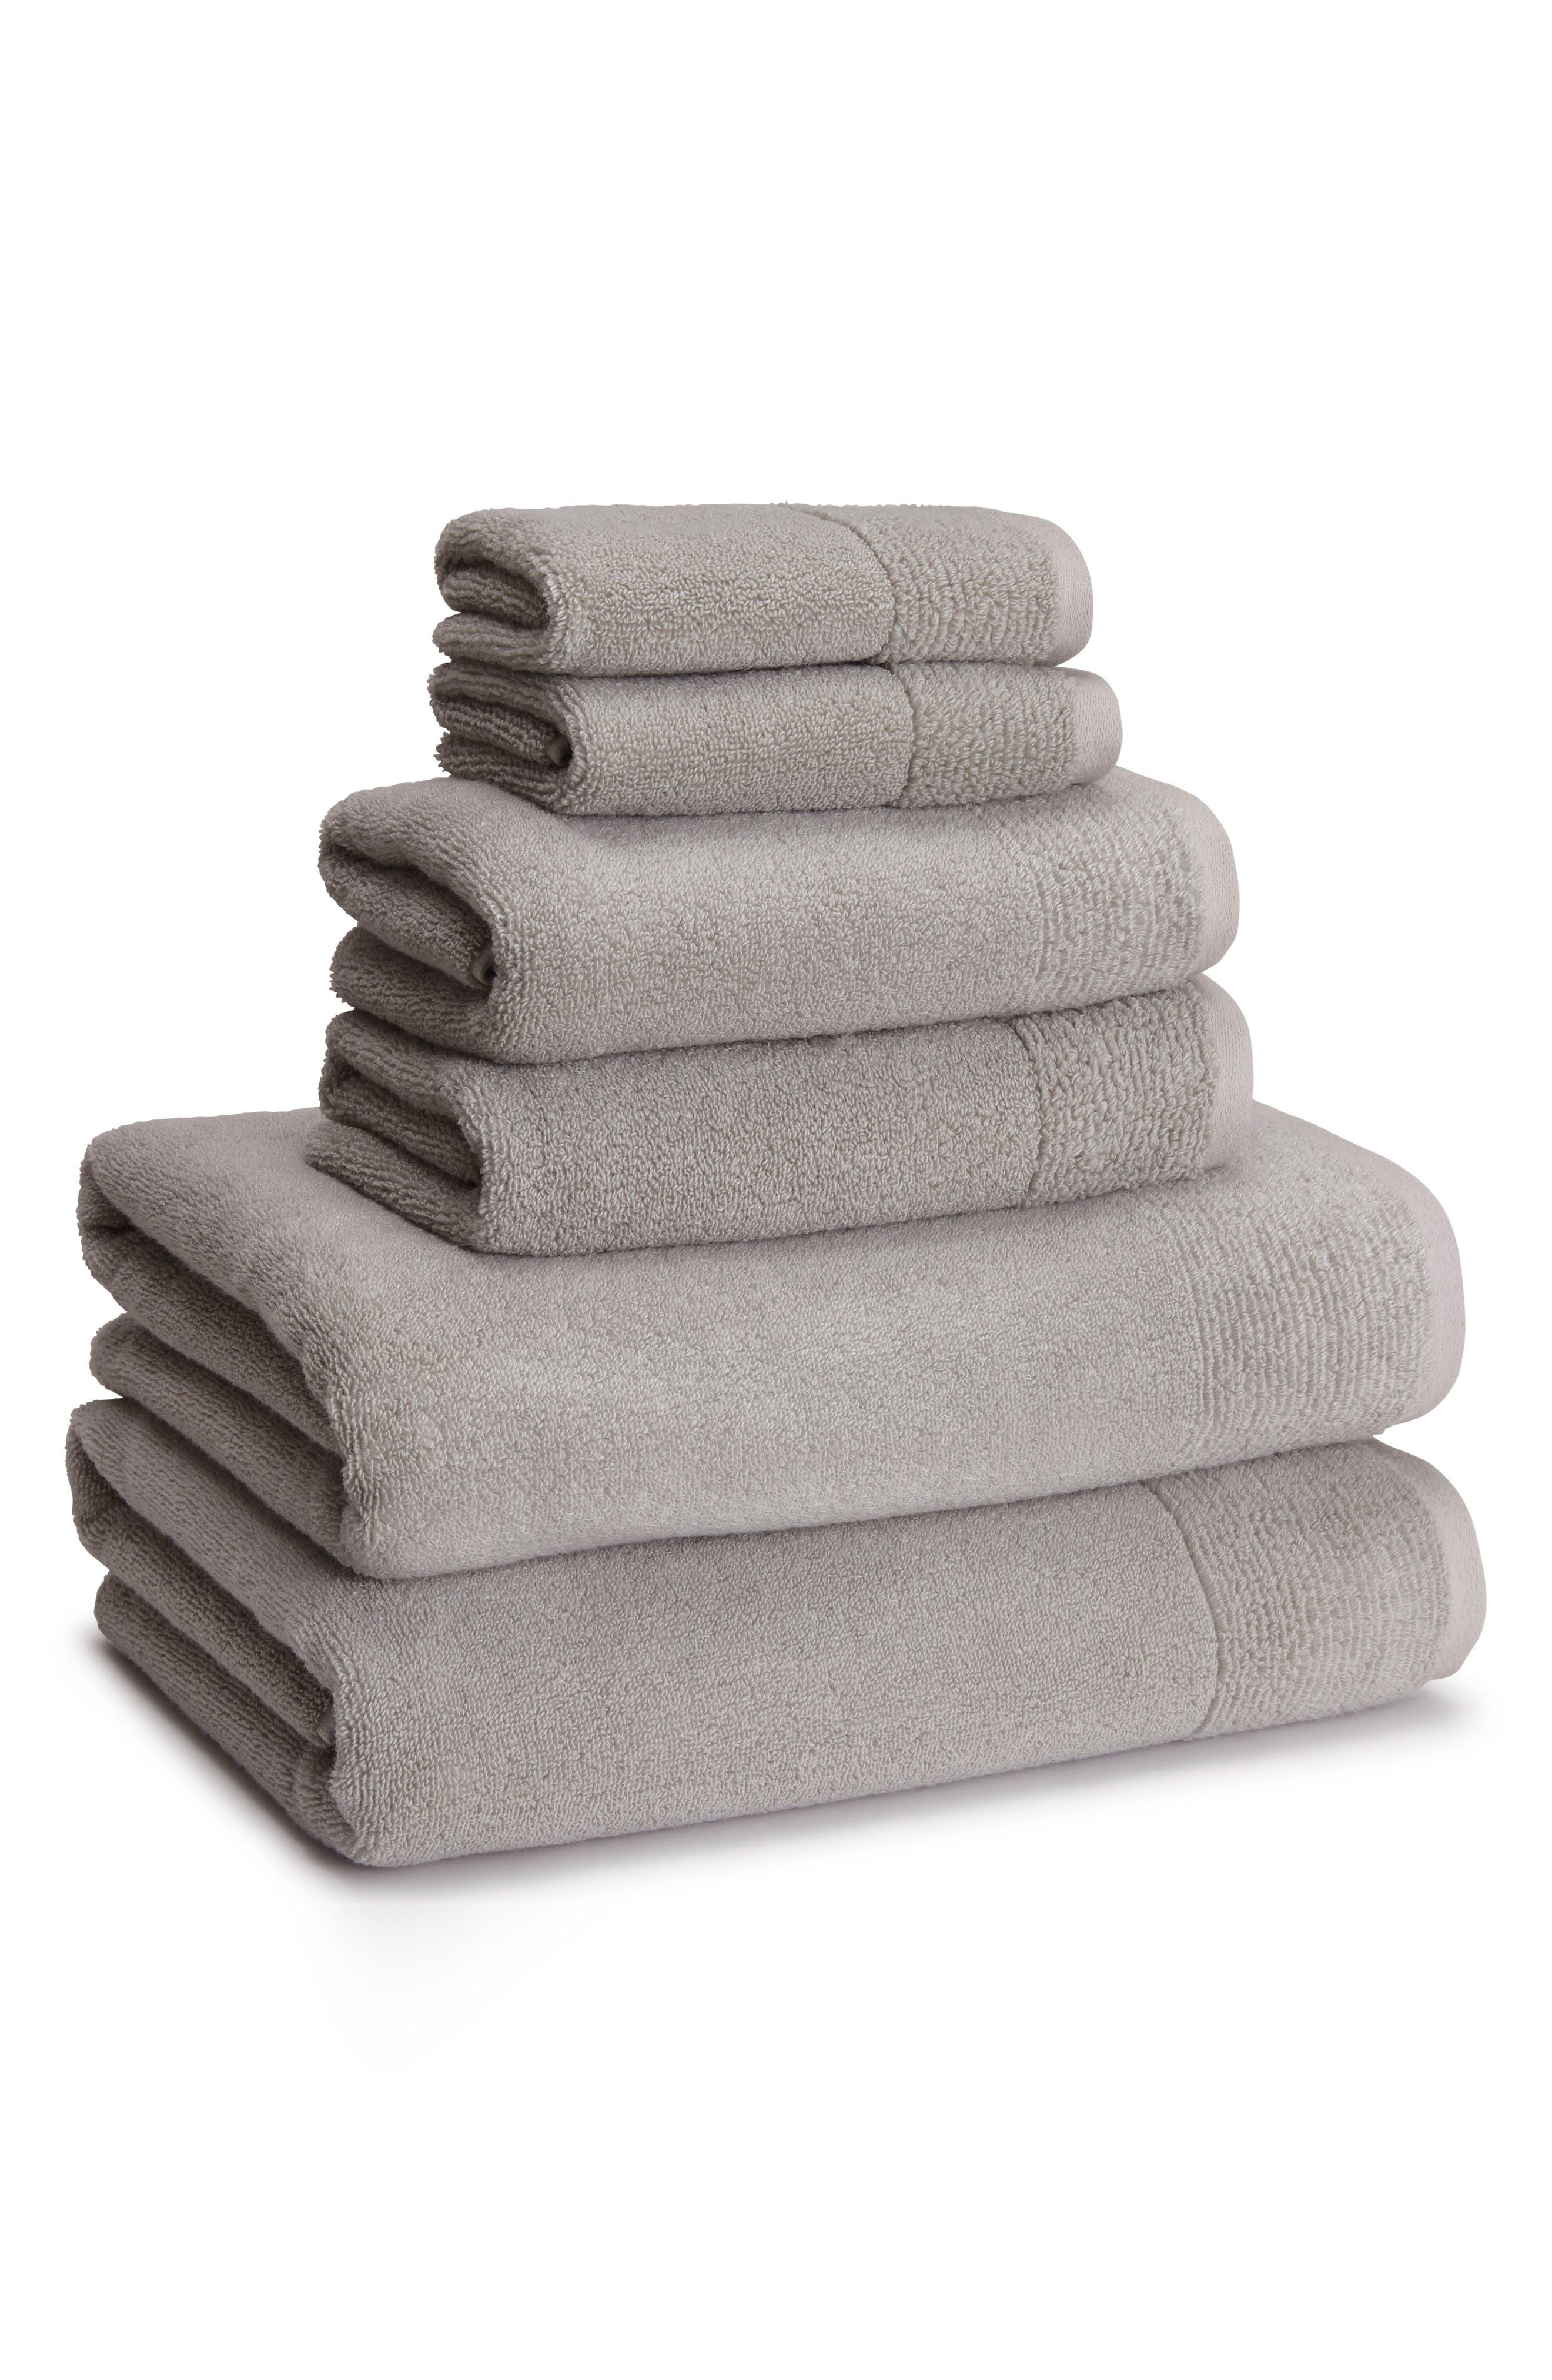 Kyoto Bath Towel,                             Main thumbnail 1, color,                             DOLPHIN GREY